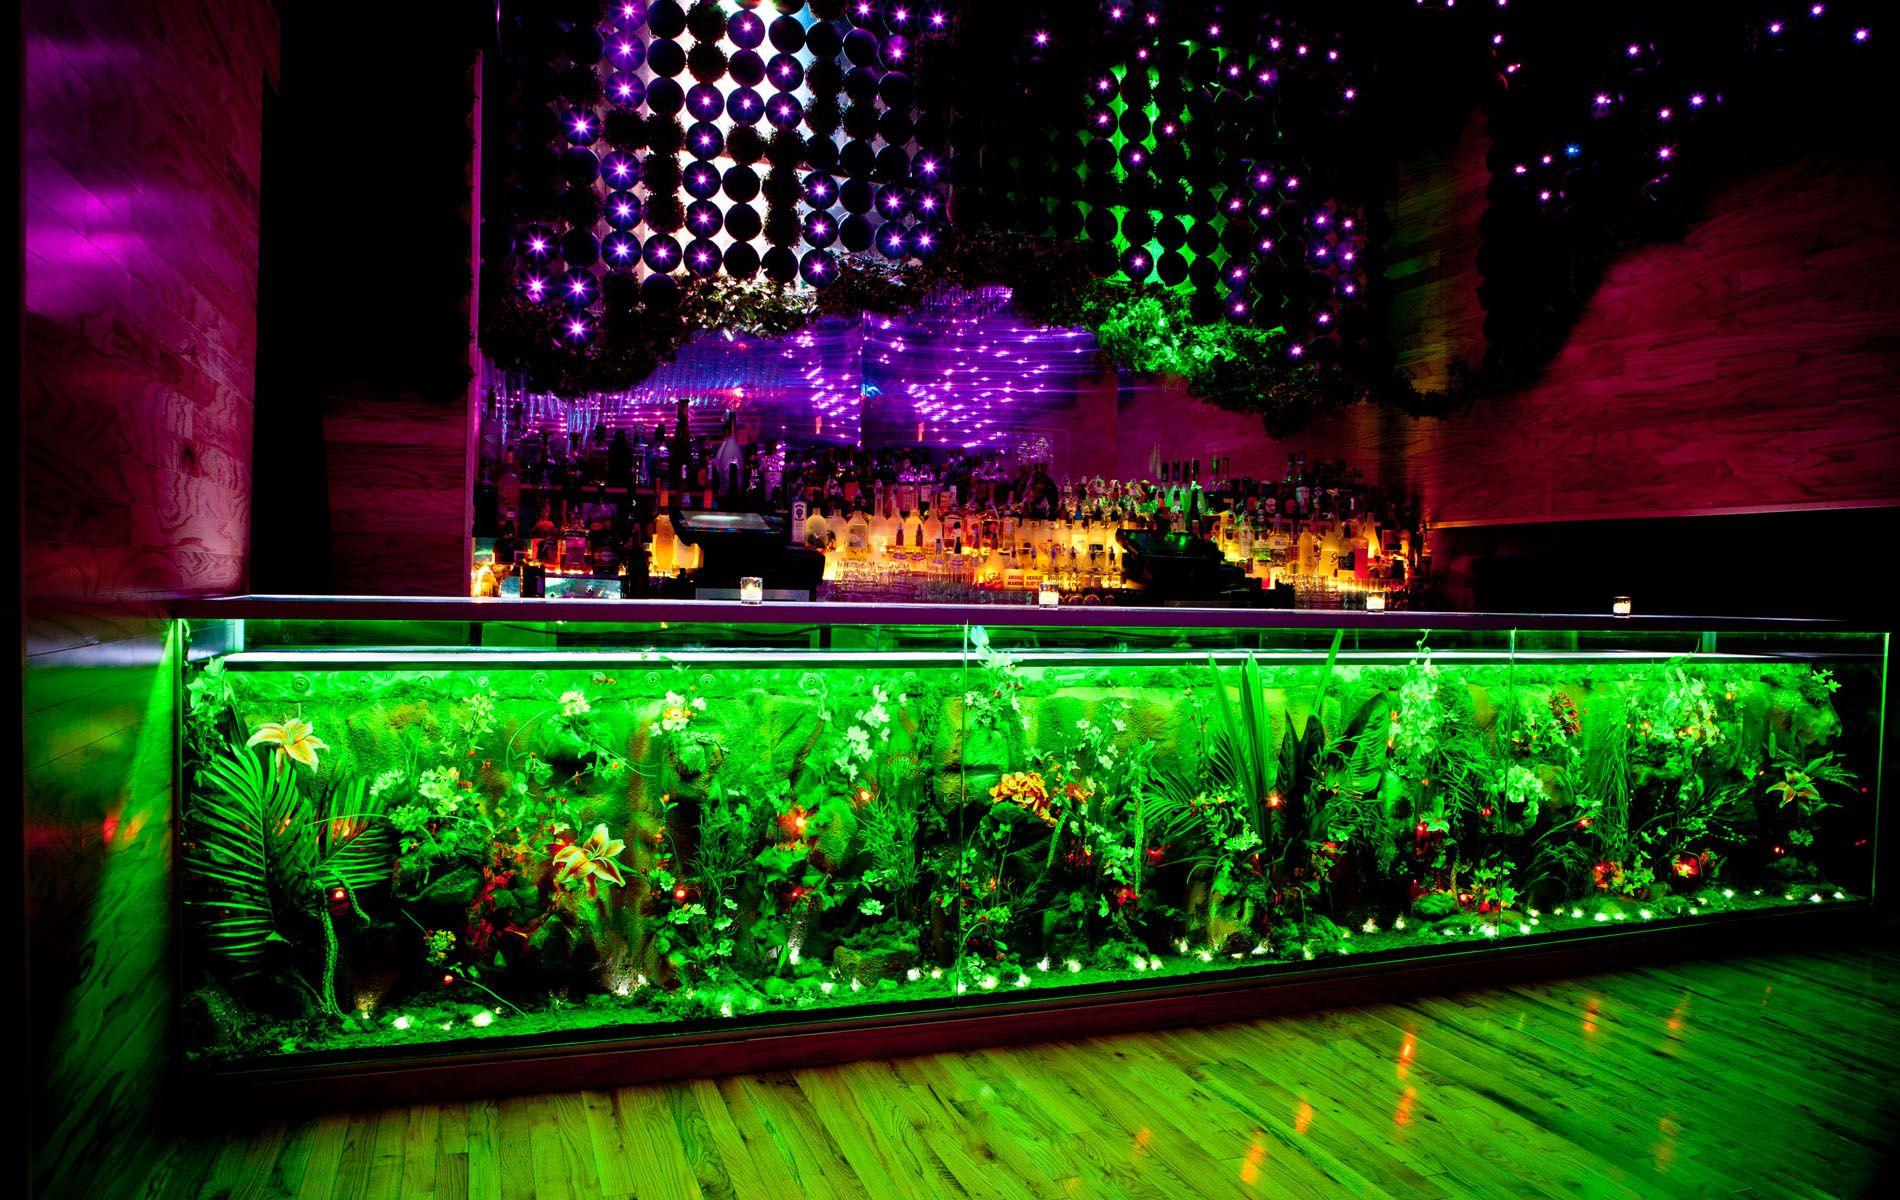 The greenhouse nyc - Joonbug Com Night Clubs Nycgreenhouseslego